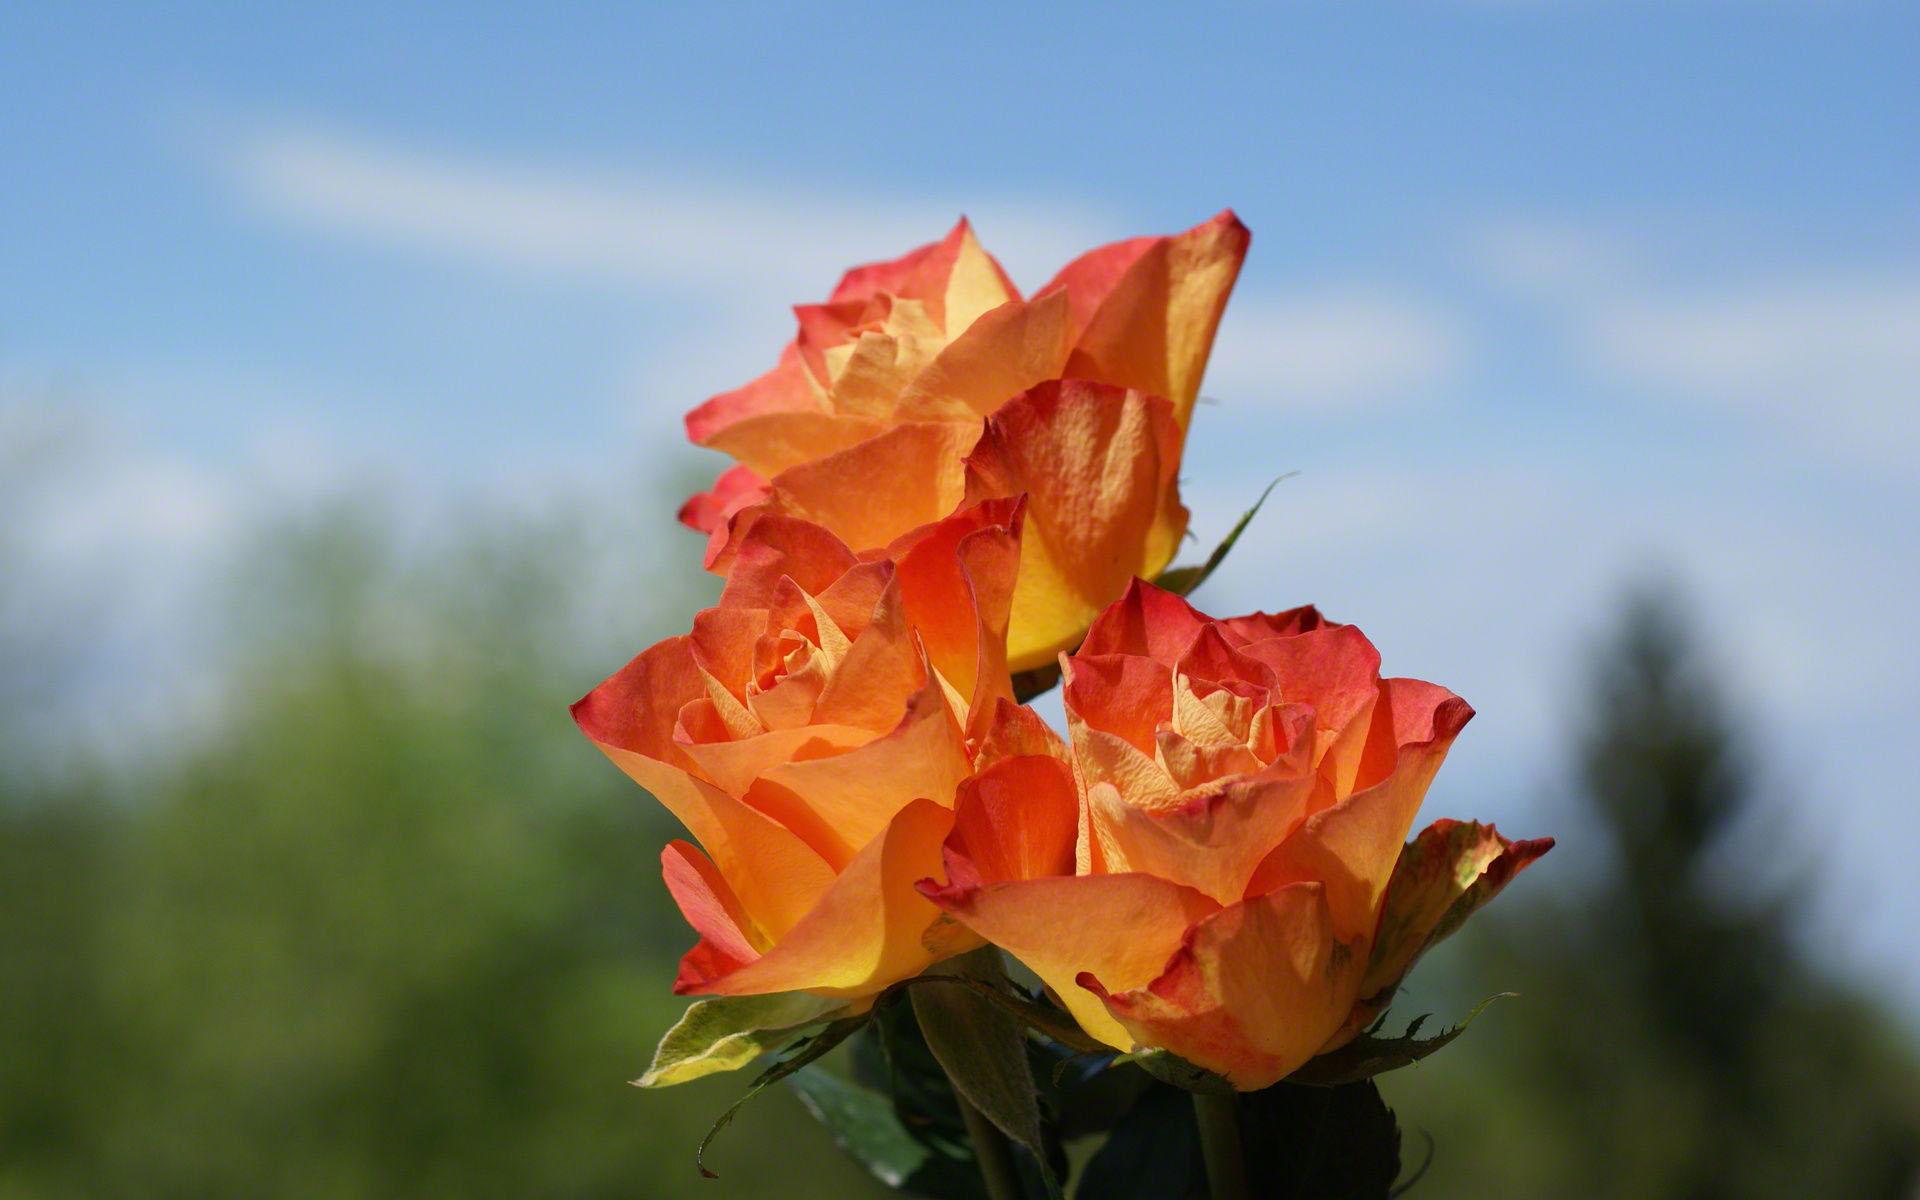 http://www.fabiovisentin.com/photography/photo/12/orange-roses-02742.jpg